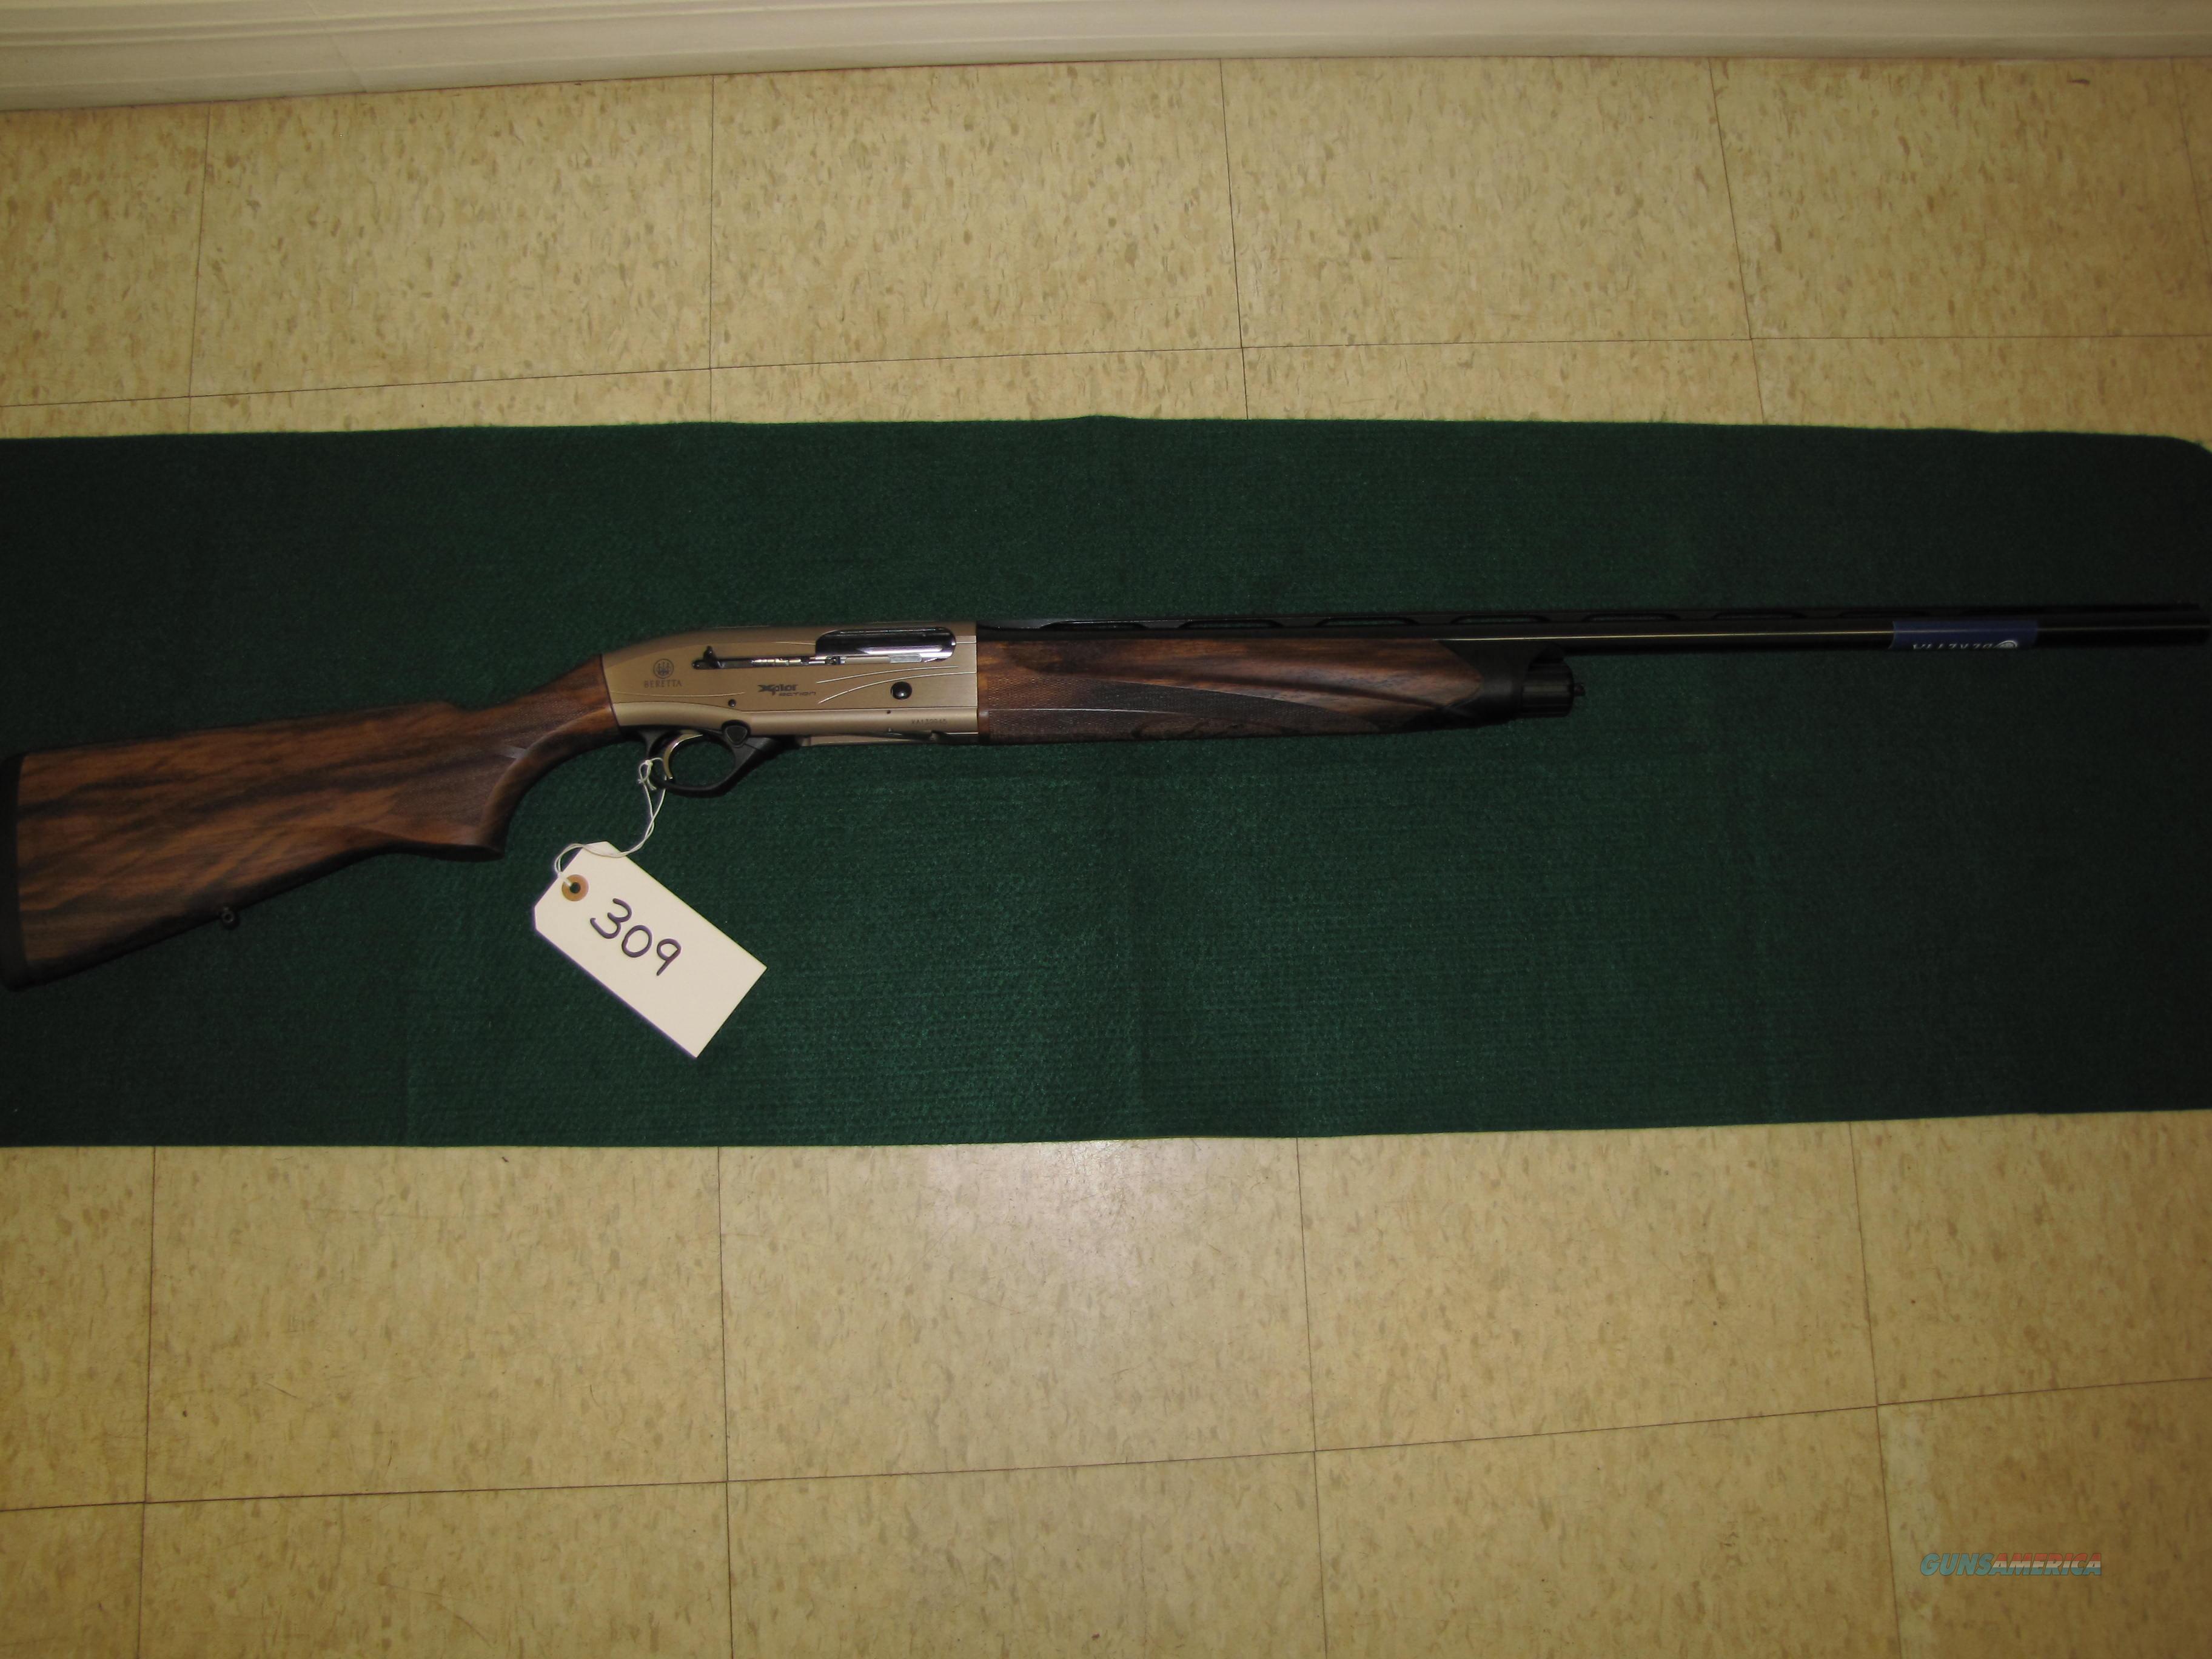 New  Beretta A400 Action 20 gauge 28 inch  Guns > Shotguns > Beretta Shotguns > Autoloaders > Hunting